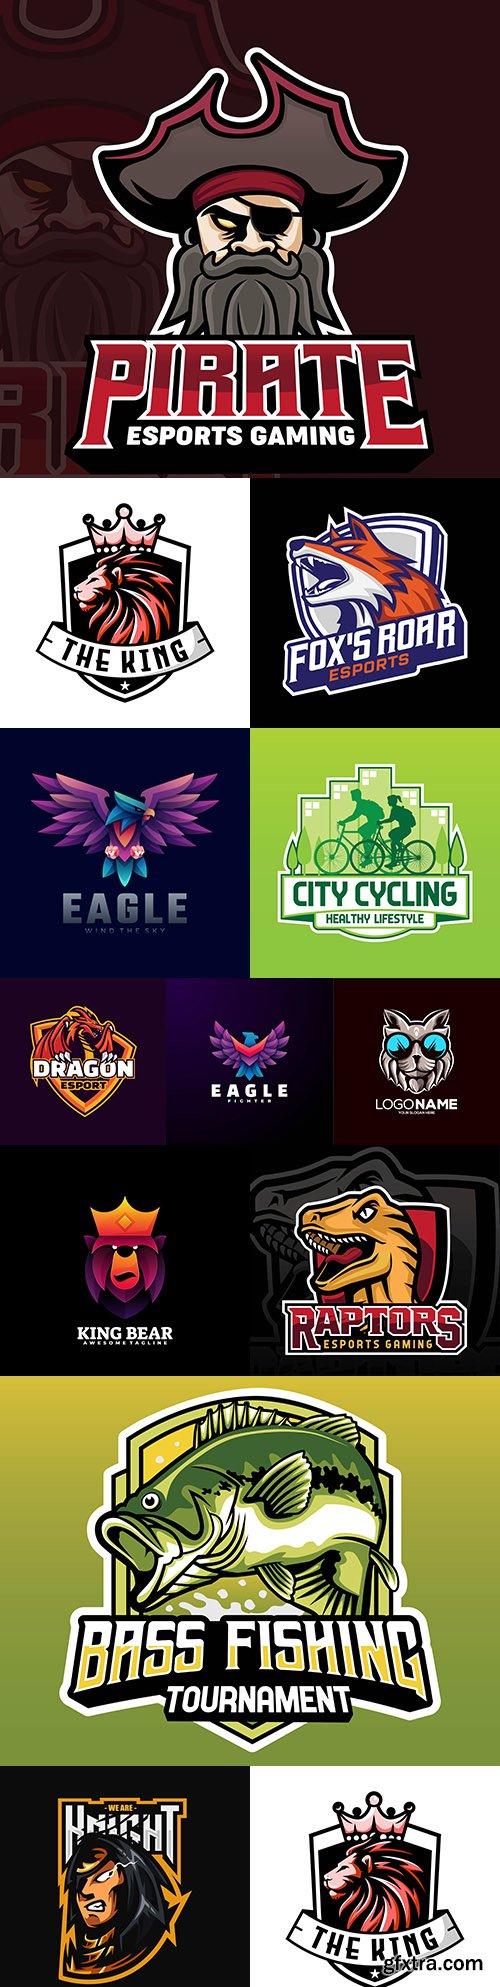 Mascot emblem and brand name logos design